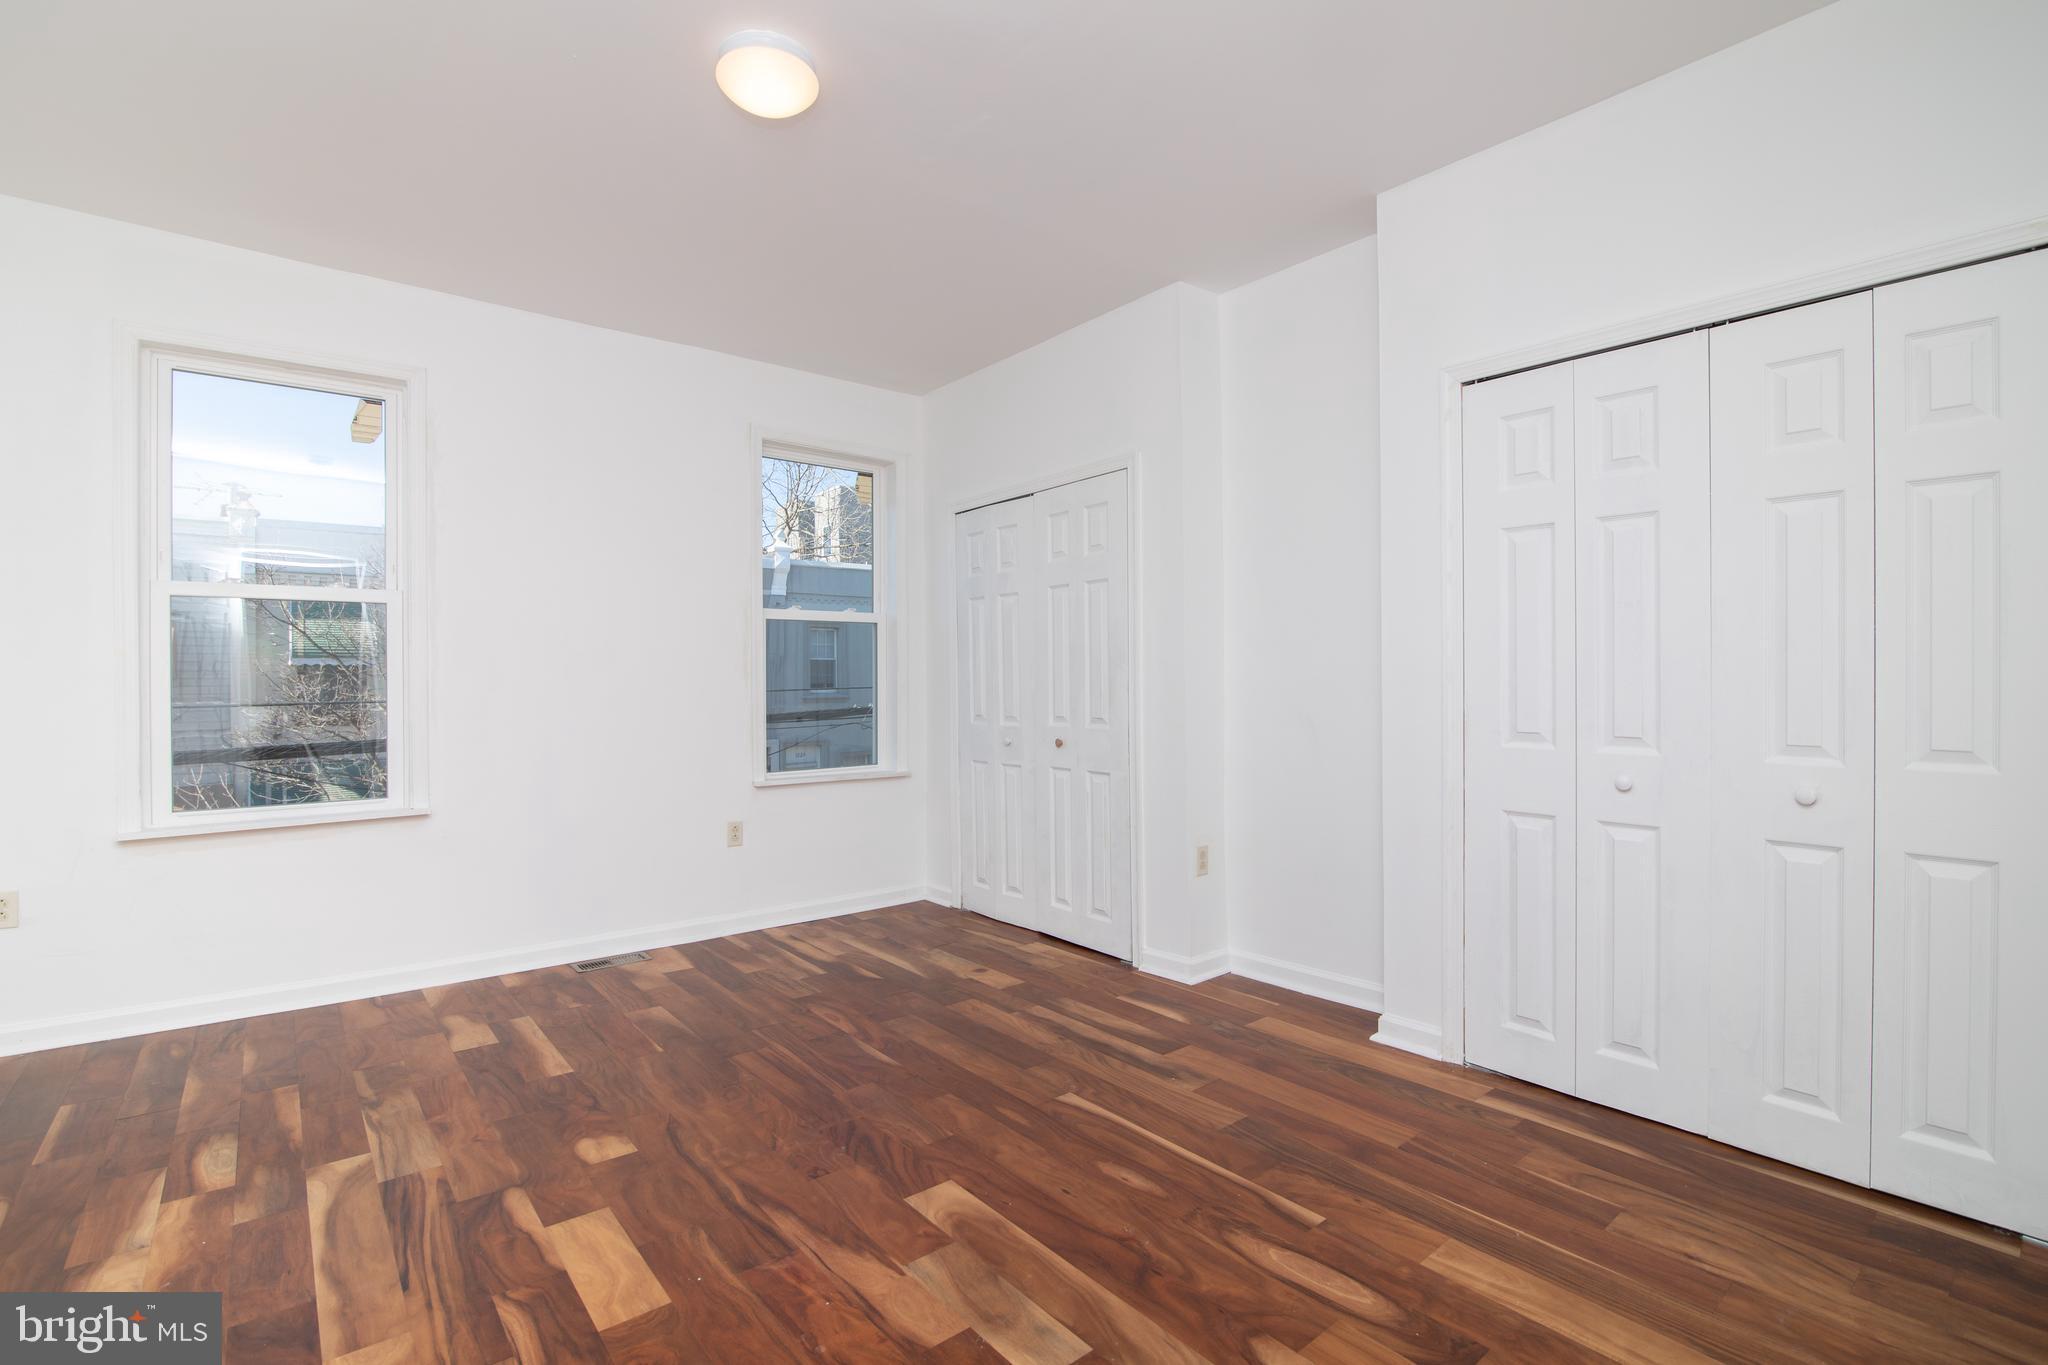 1231 S 26TH STREET, PHILADELPHIA, Pennsylvania 19146, 3 Bedrooms Bedrooms, ,2 BathroomsBathrooms,Townhouse,For Sale,1231 S 26TH STREET,PAPH866704